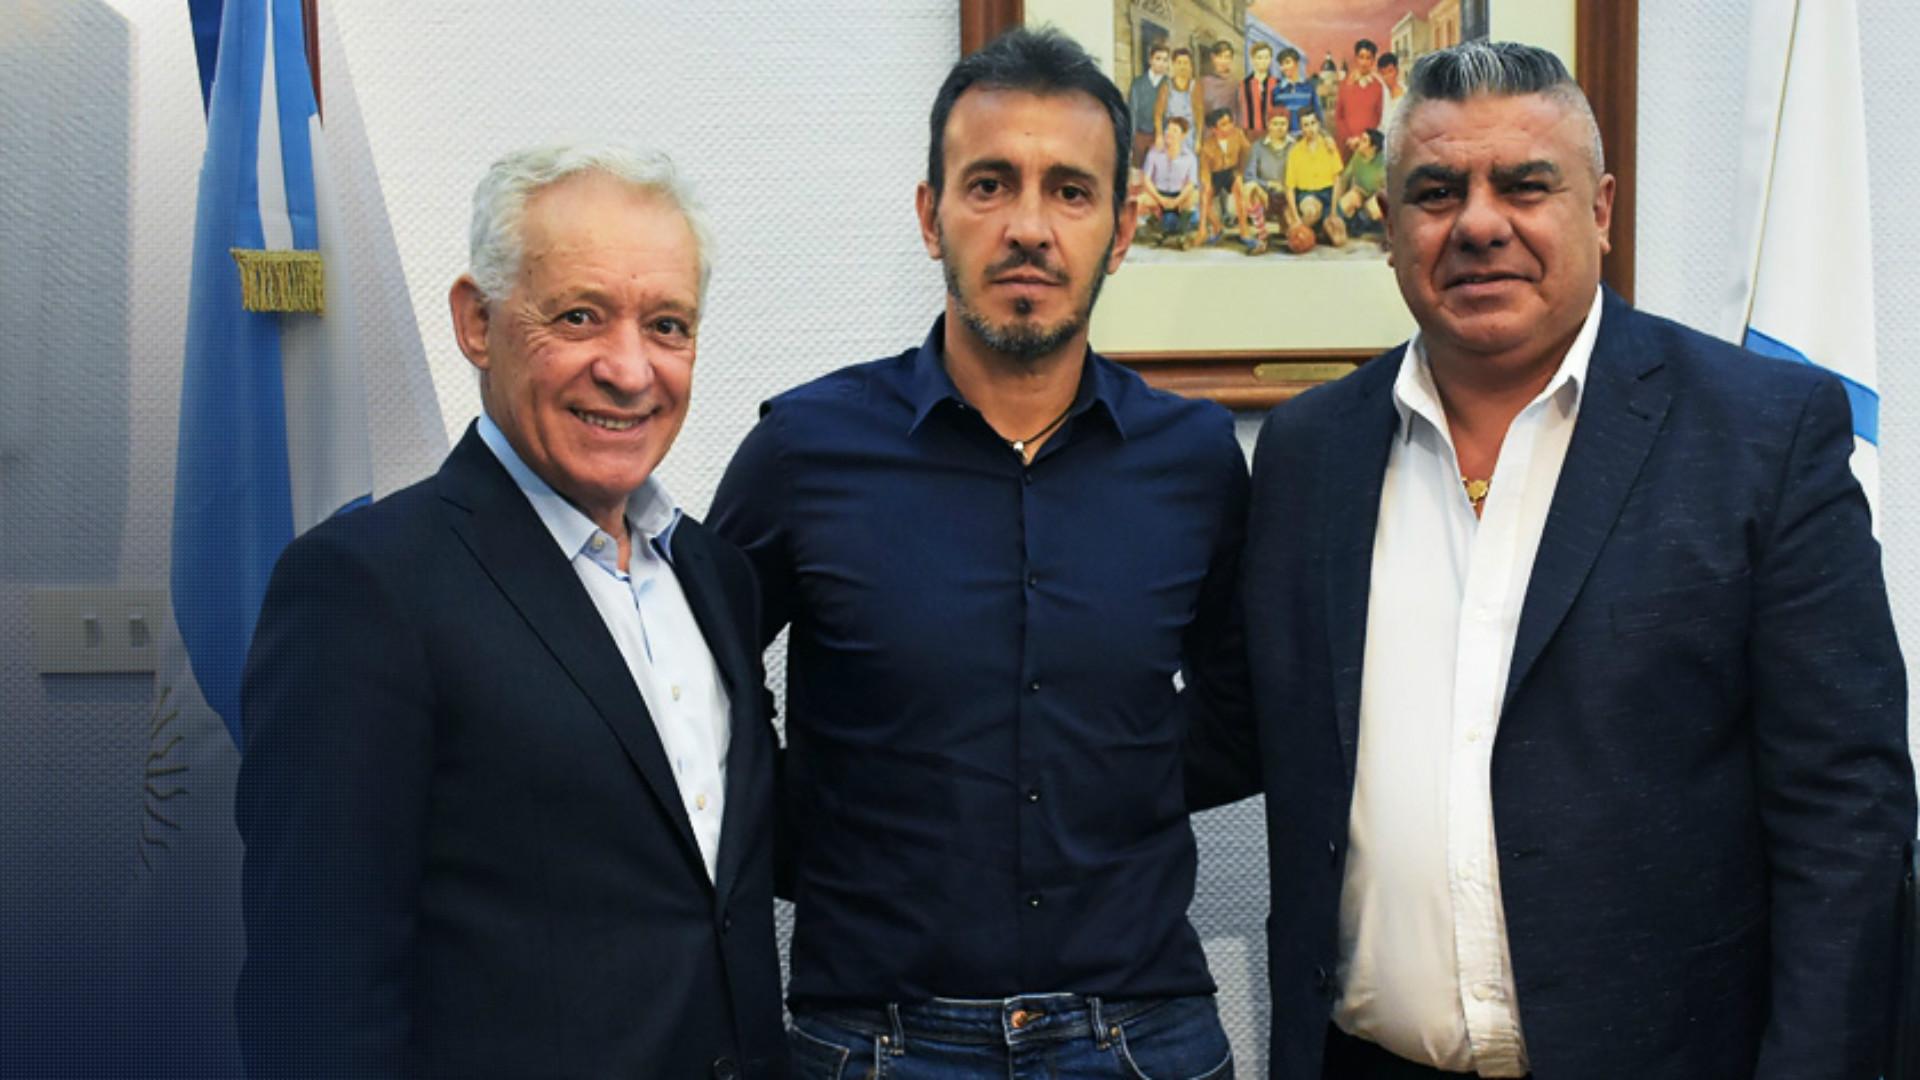 Fernando Batista Victor Blanco Claudio Tapia AFA Seleccion Argentina Sub 20